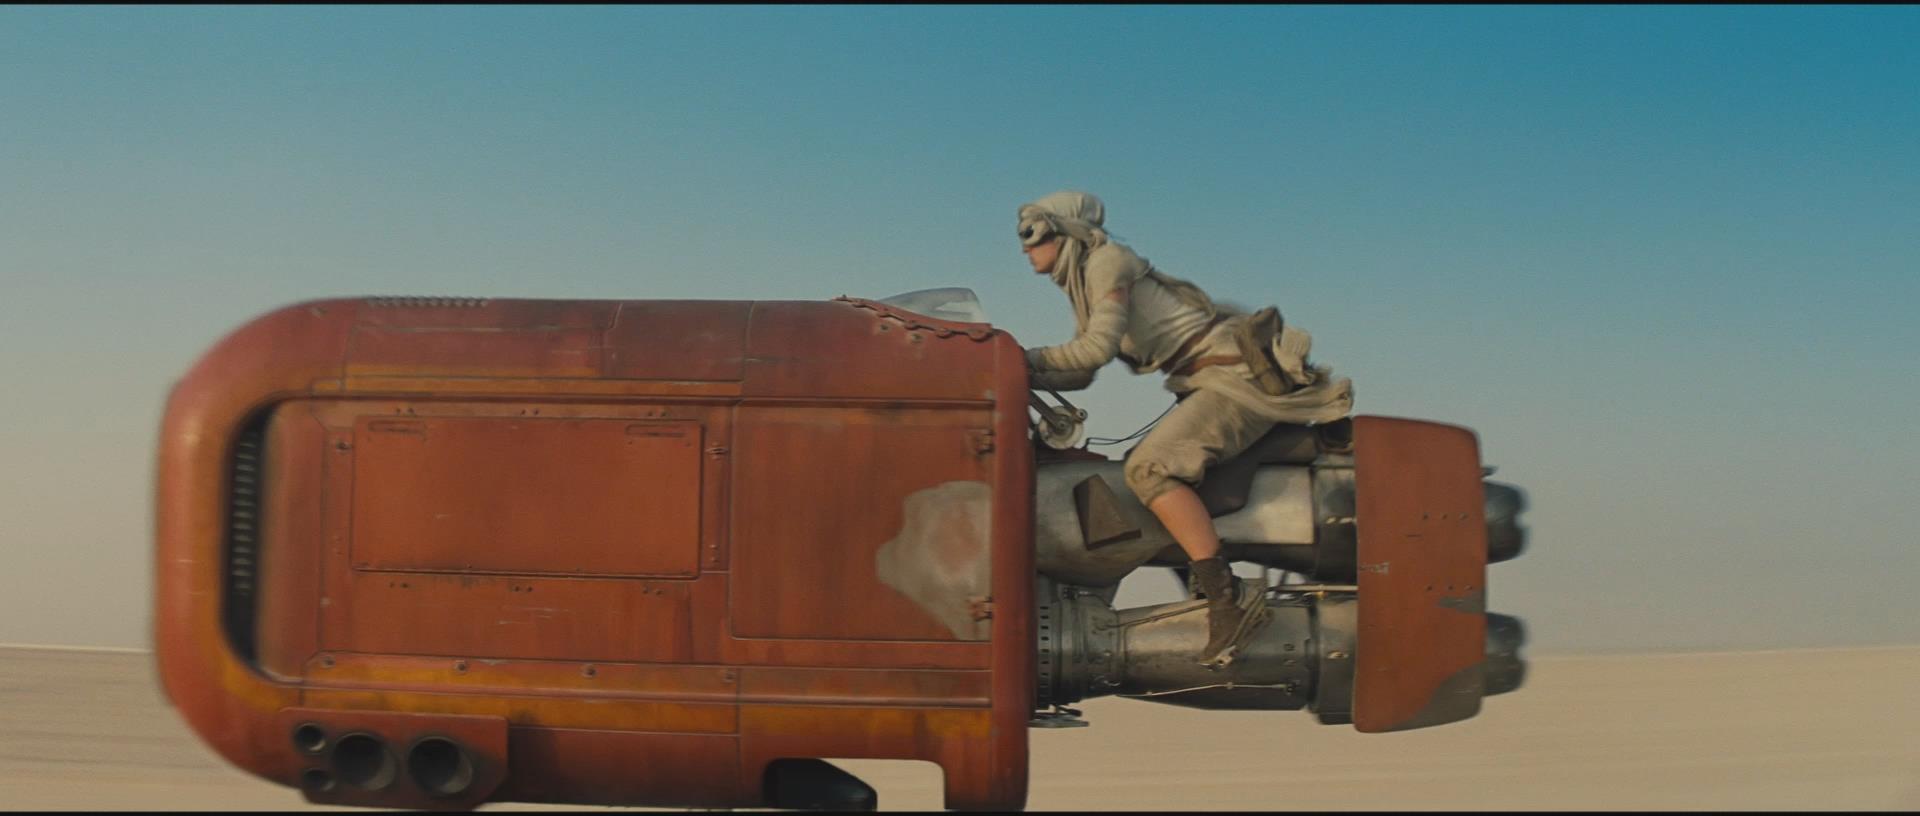 Star Wars – Daisy Ridley